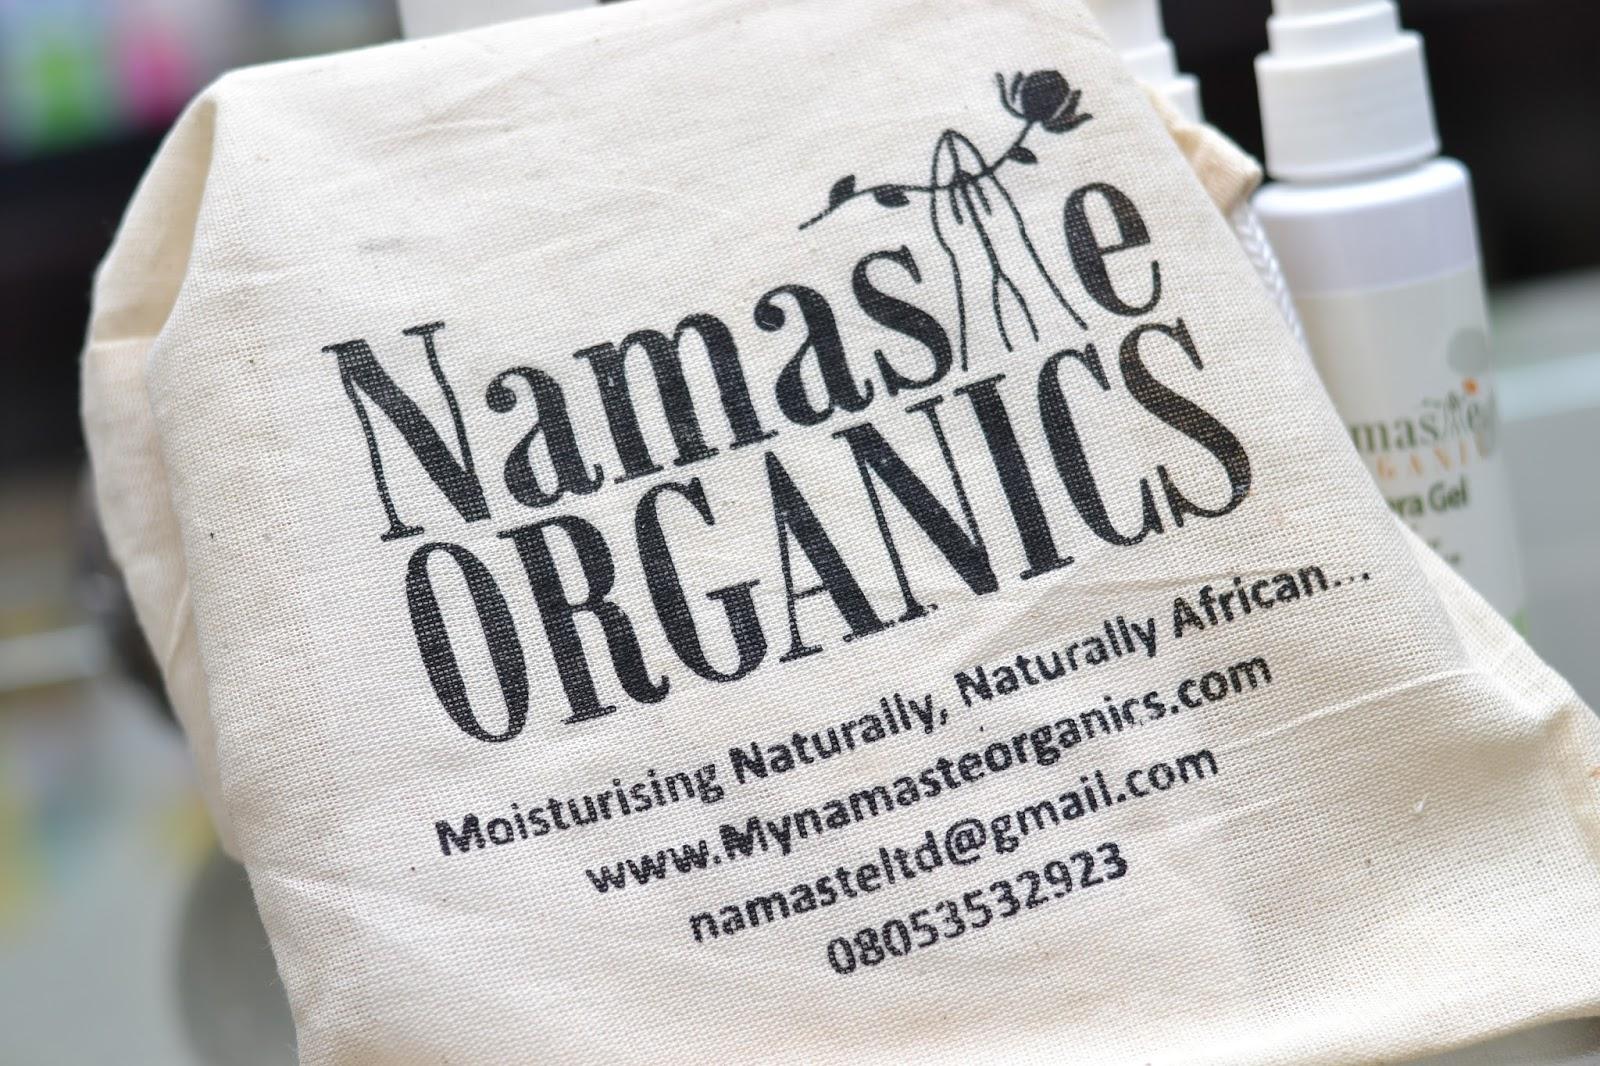 Products from Namaste Organics